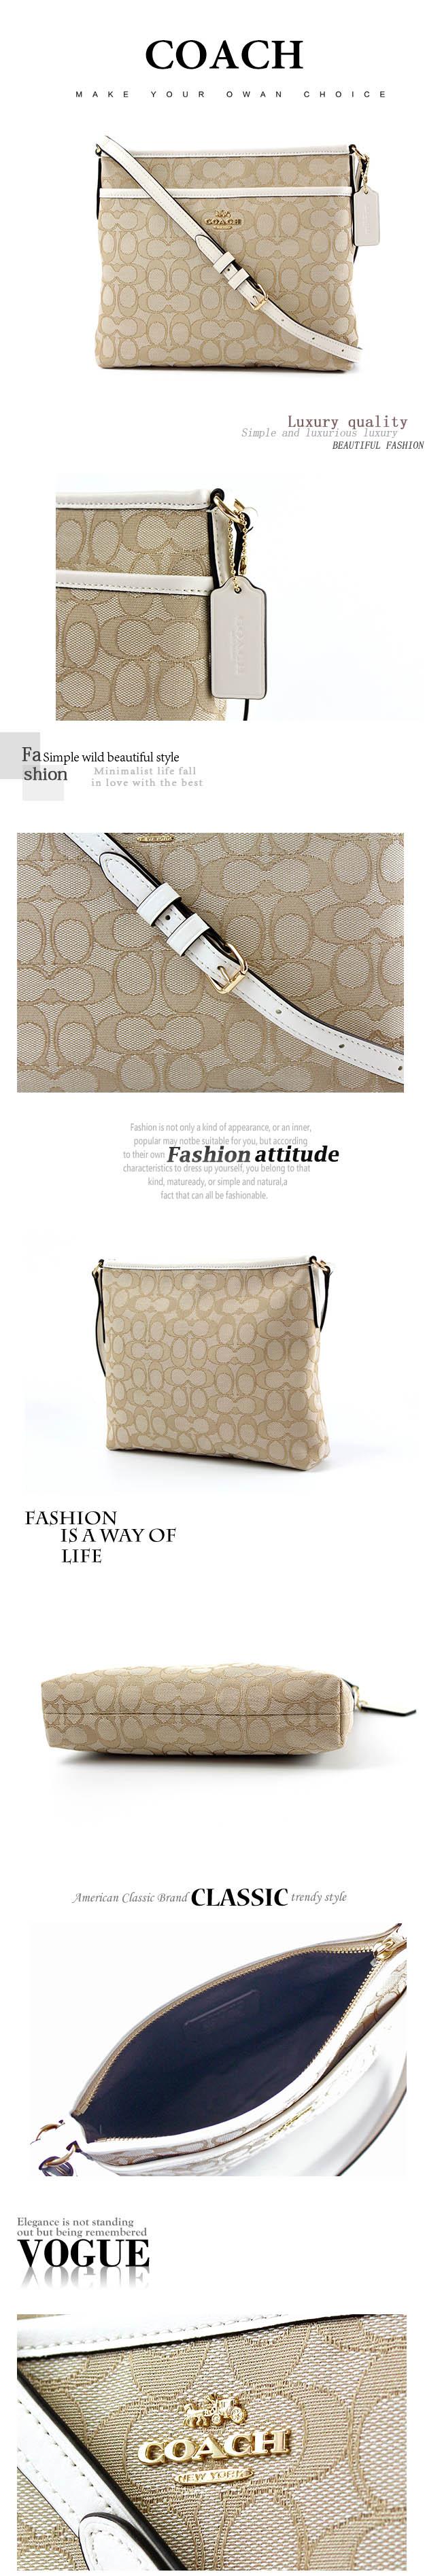 44520dc78108 COACH 緹花LOGO織布前置物袋斜背包-小/白色-friDay購物